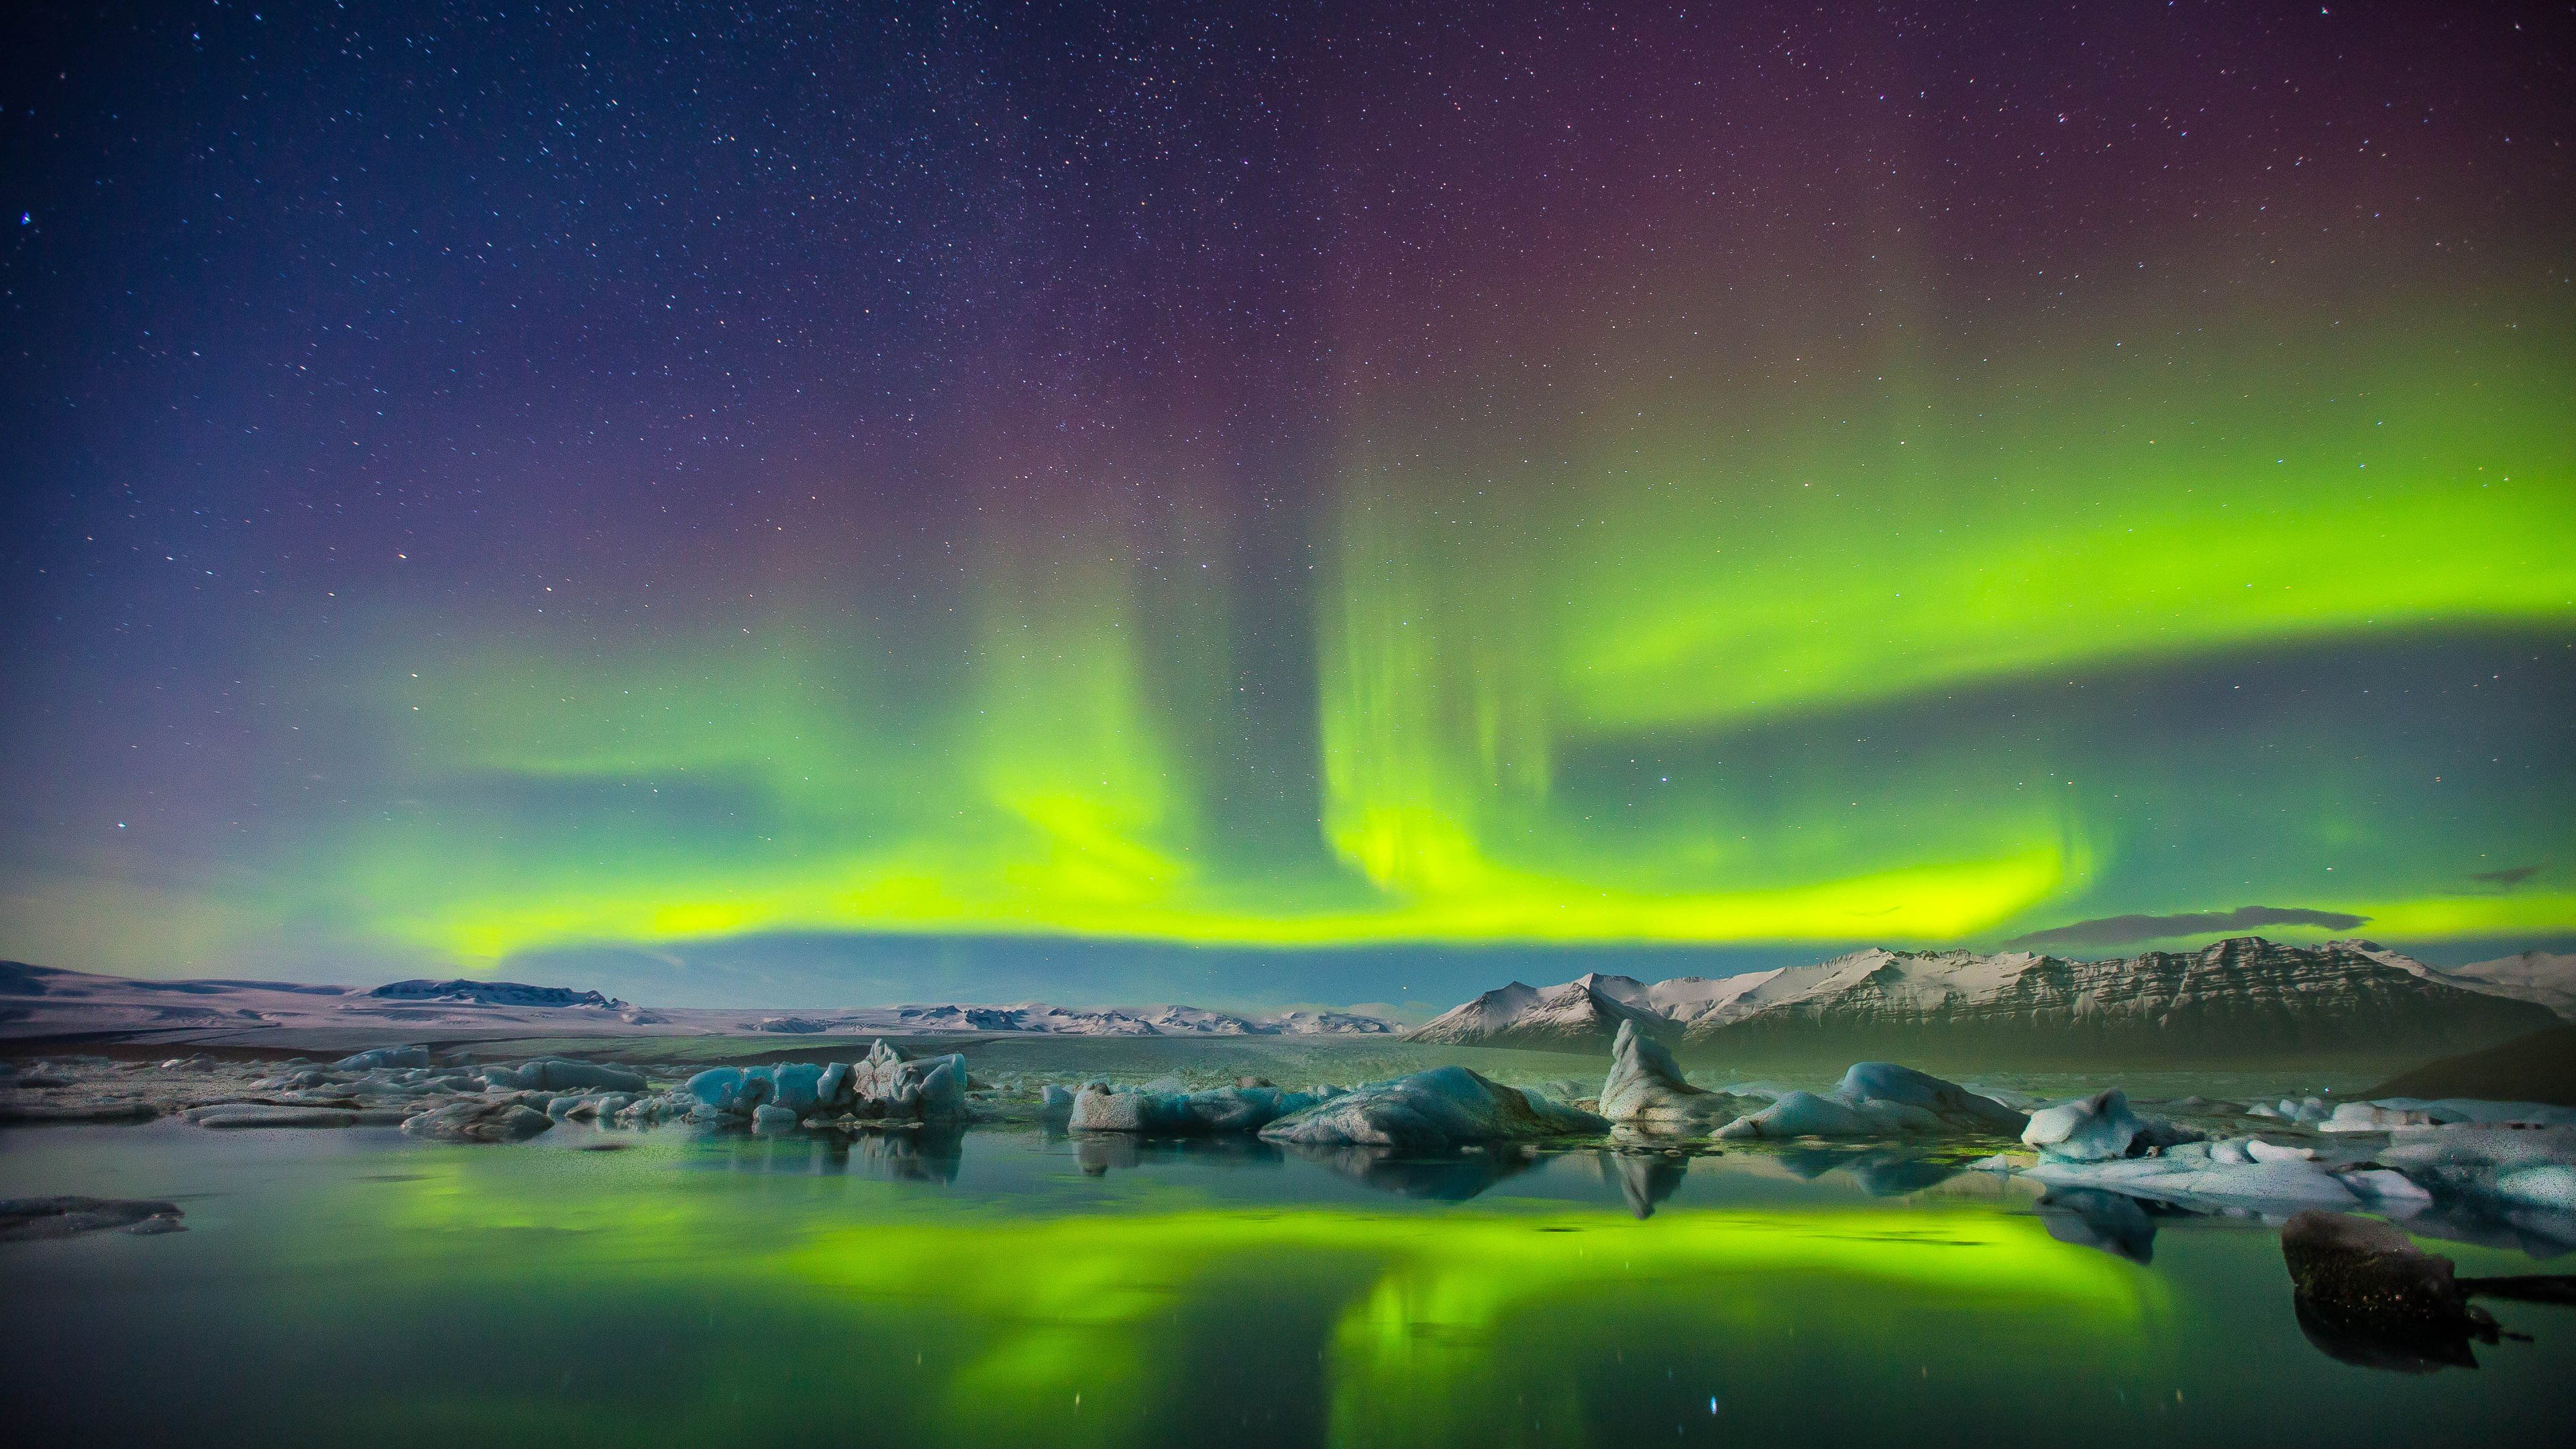 Aurora Borealis Hd Wallpapers Backgrounds Wallpaper Northern Lights Wallpaper Aurora Borealis Wallpaper Hd Wallpaper Sites